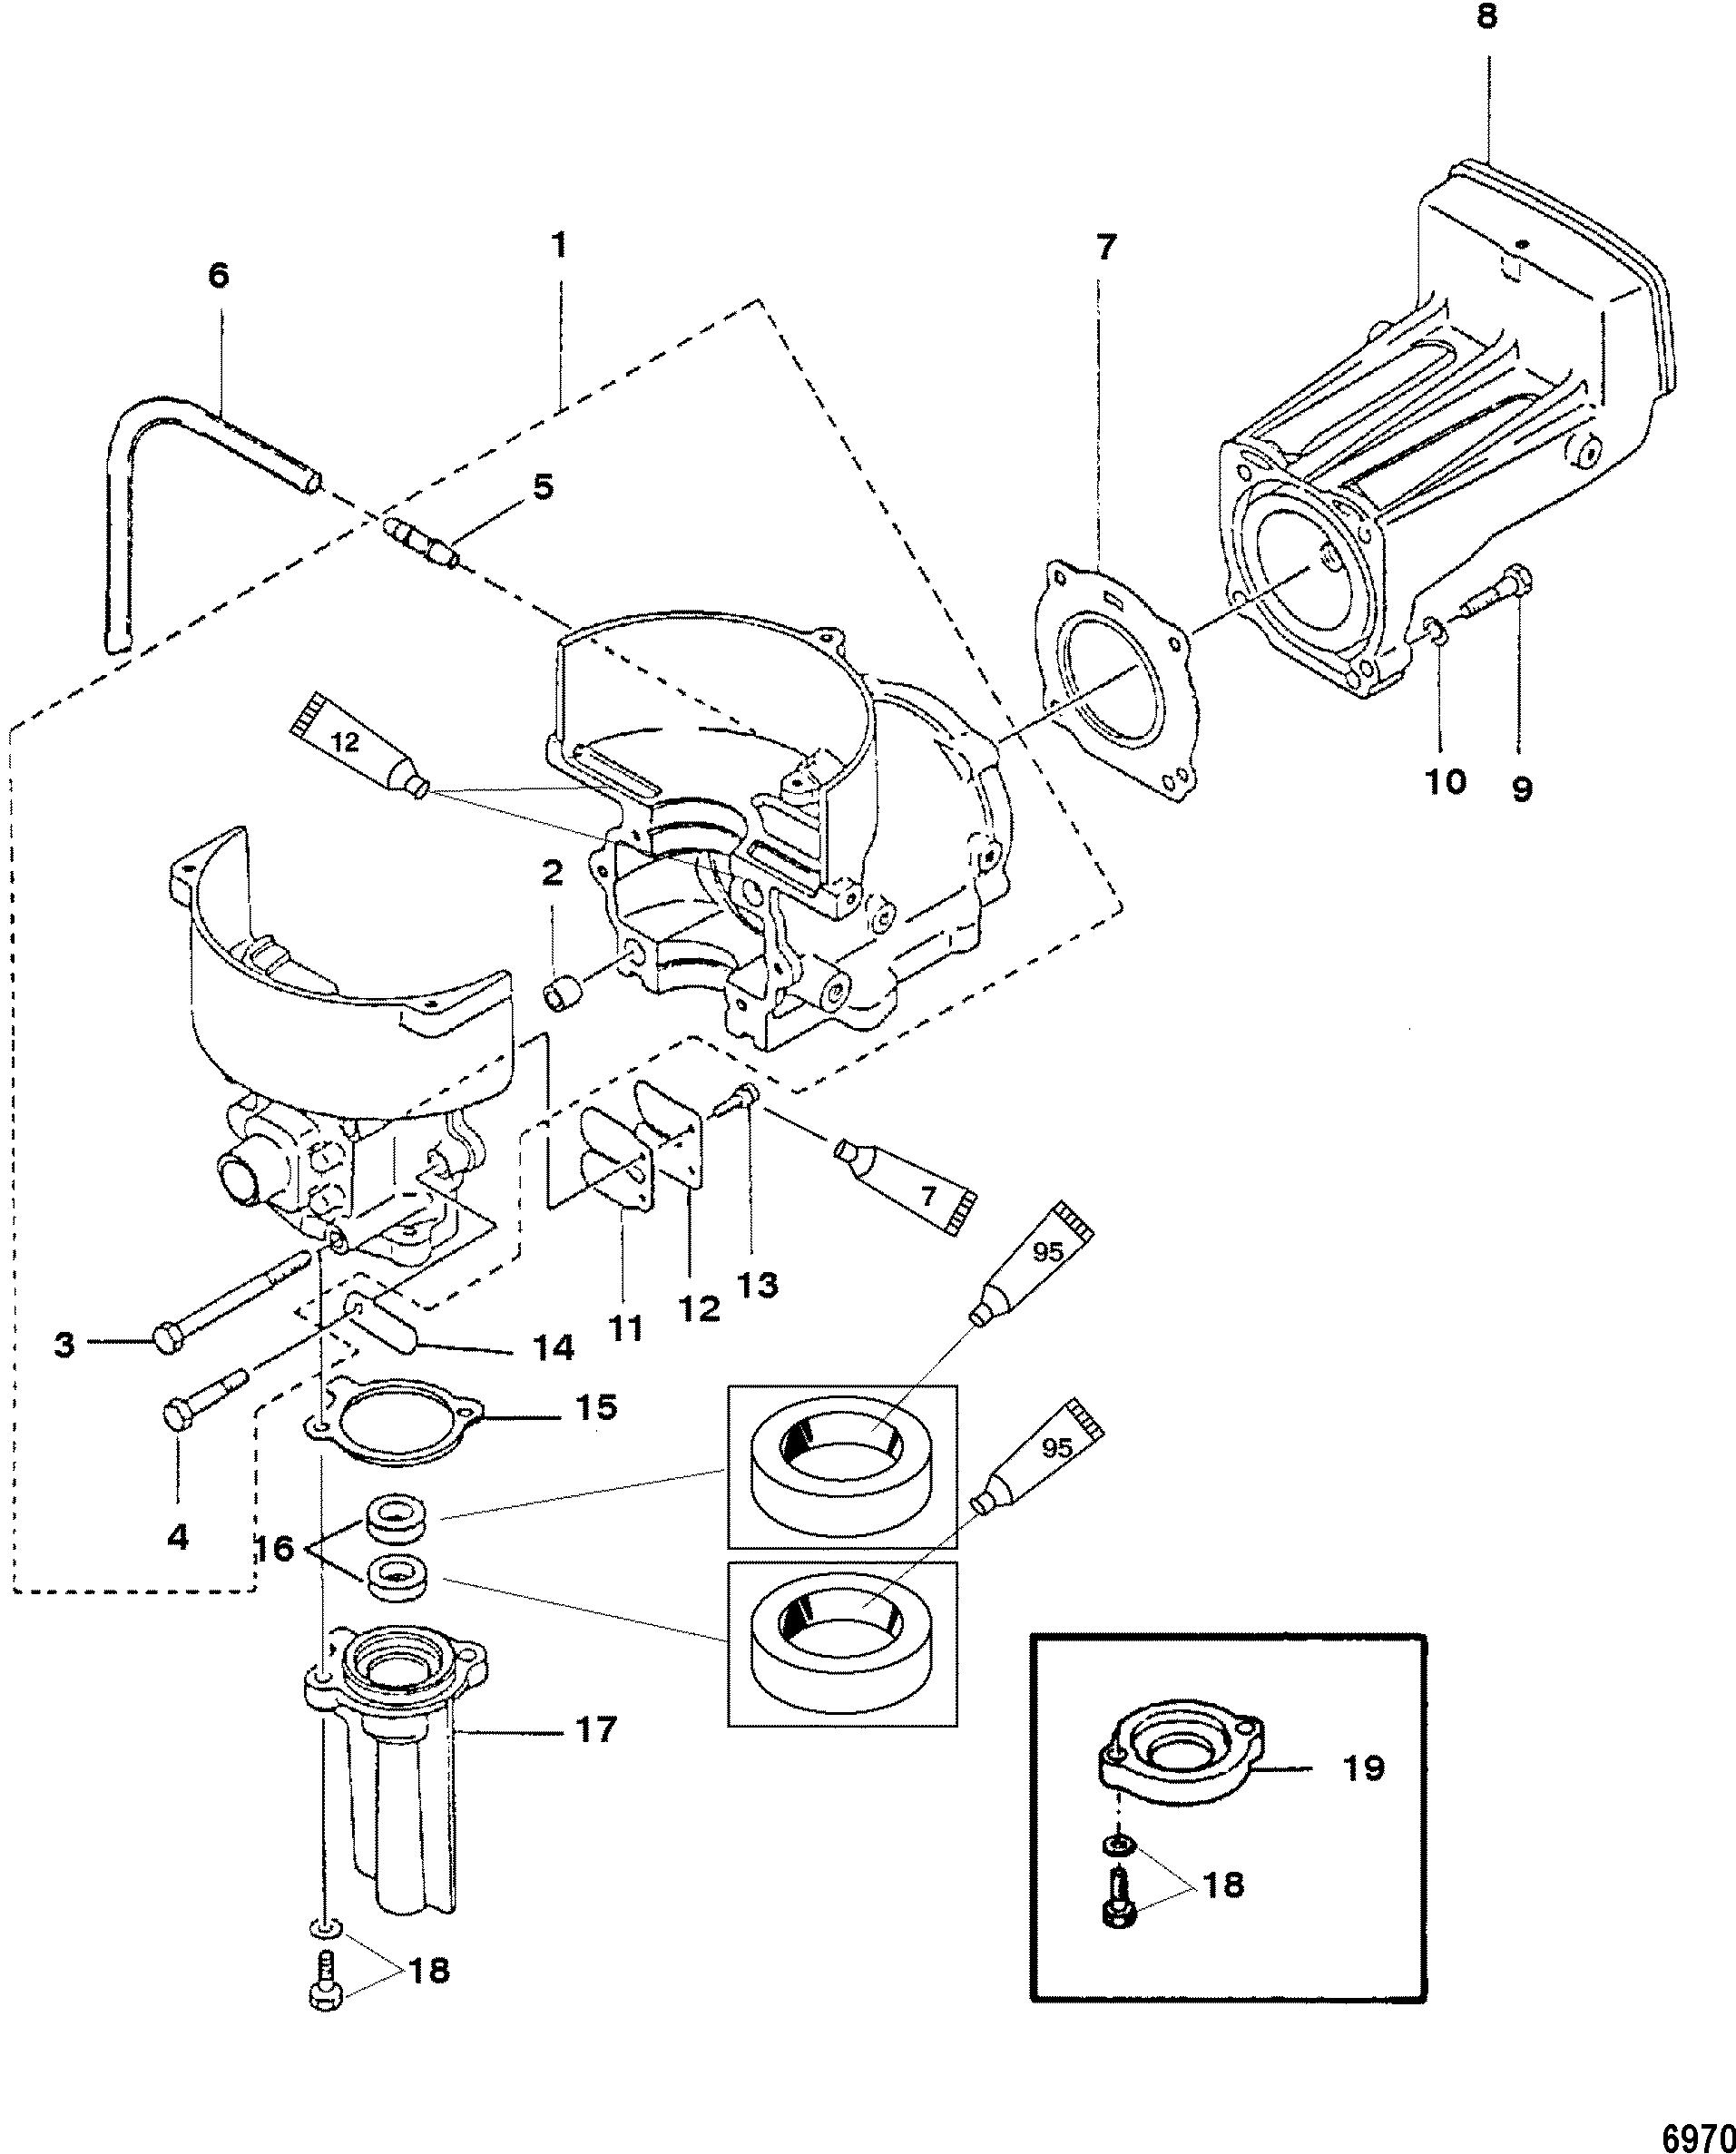 1991 evinrude 200hp wiring diagram